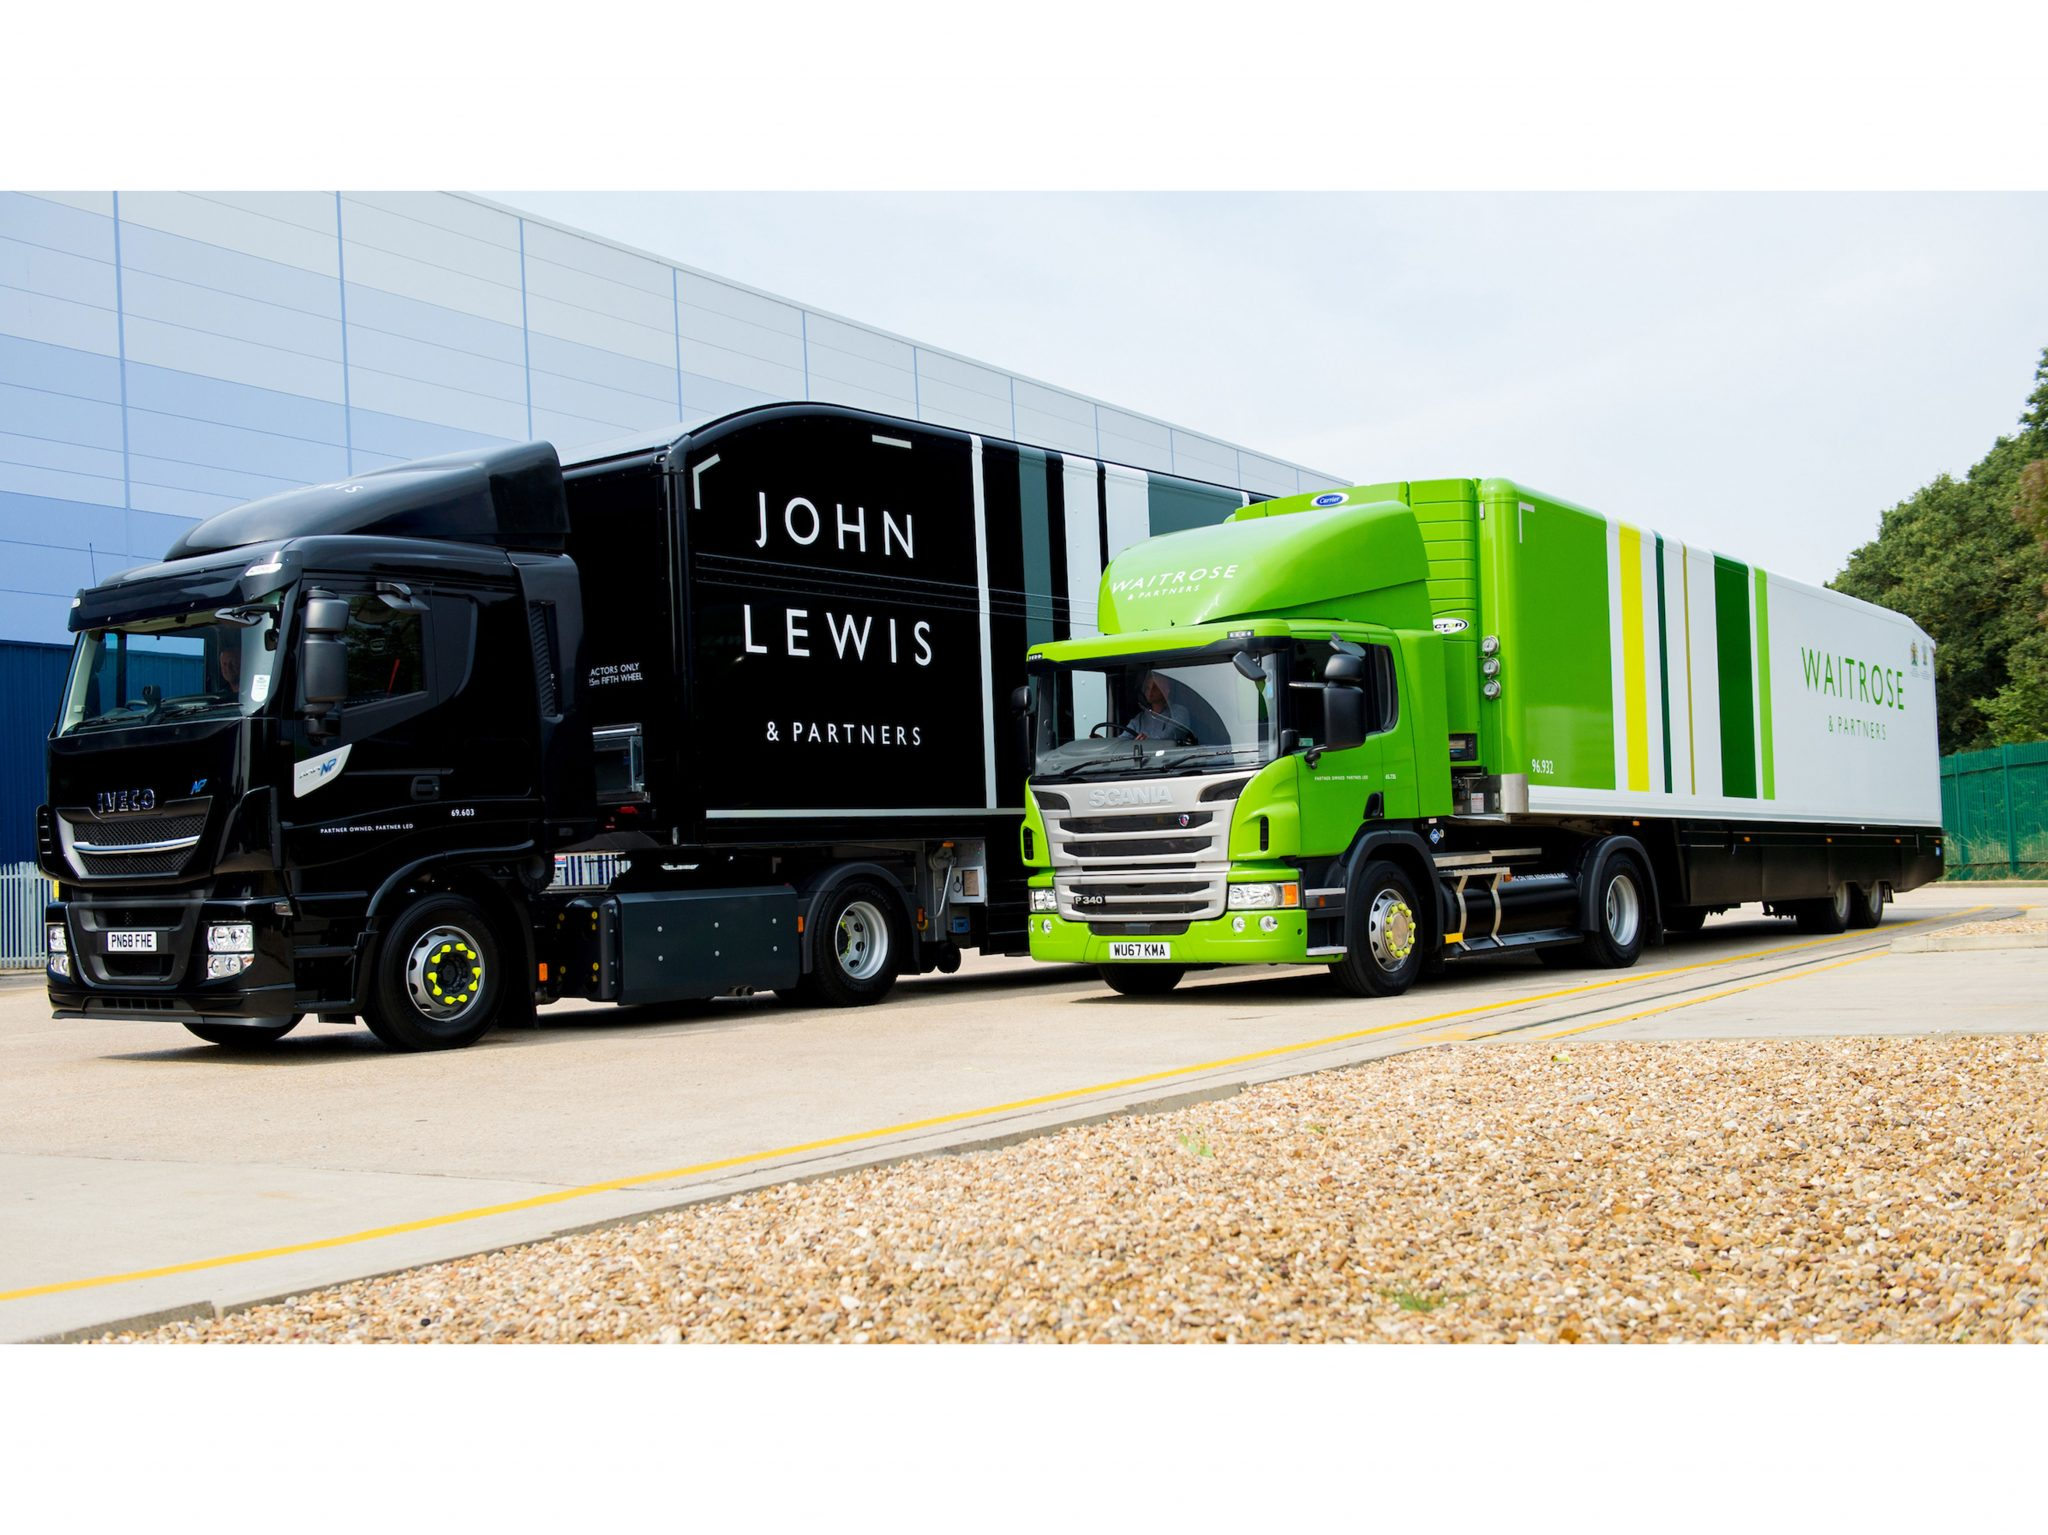 John Lewis Partnership makes green business commitment